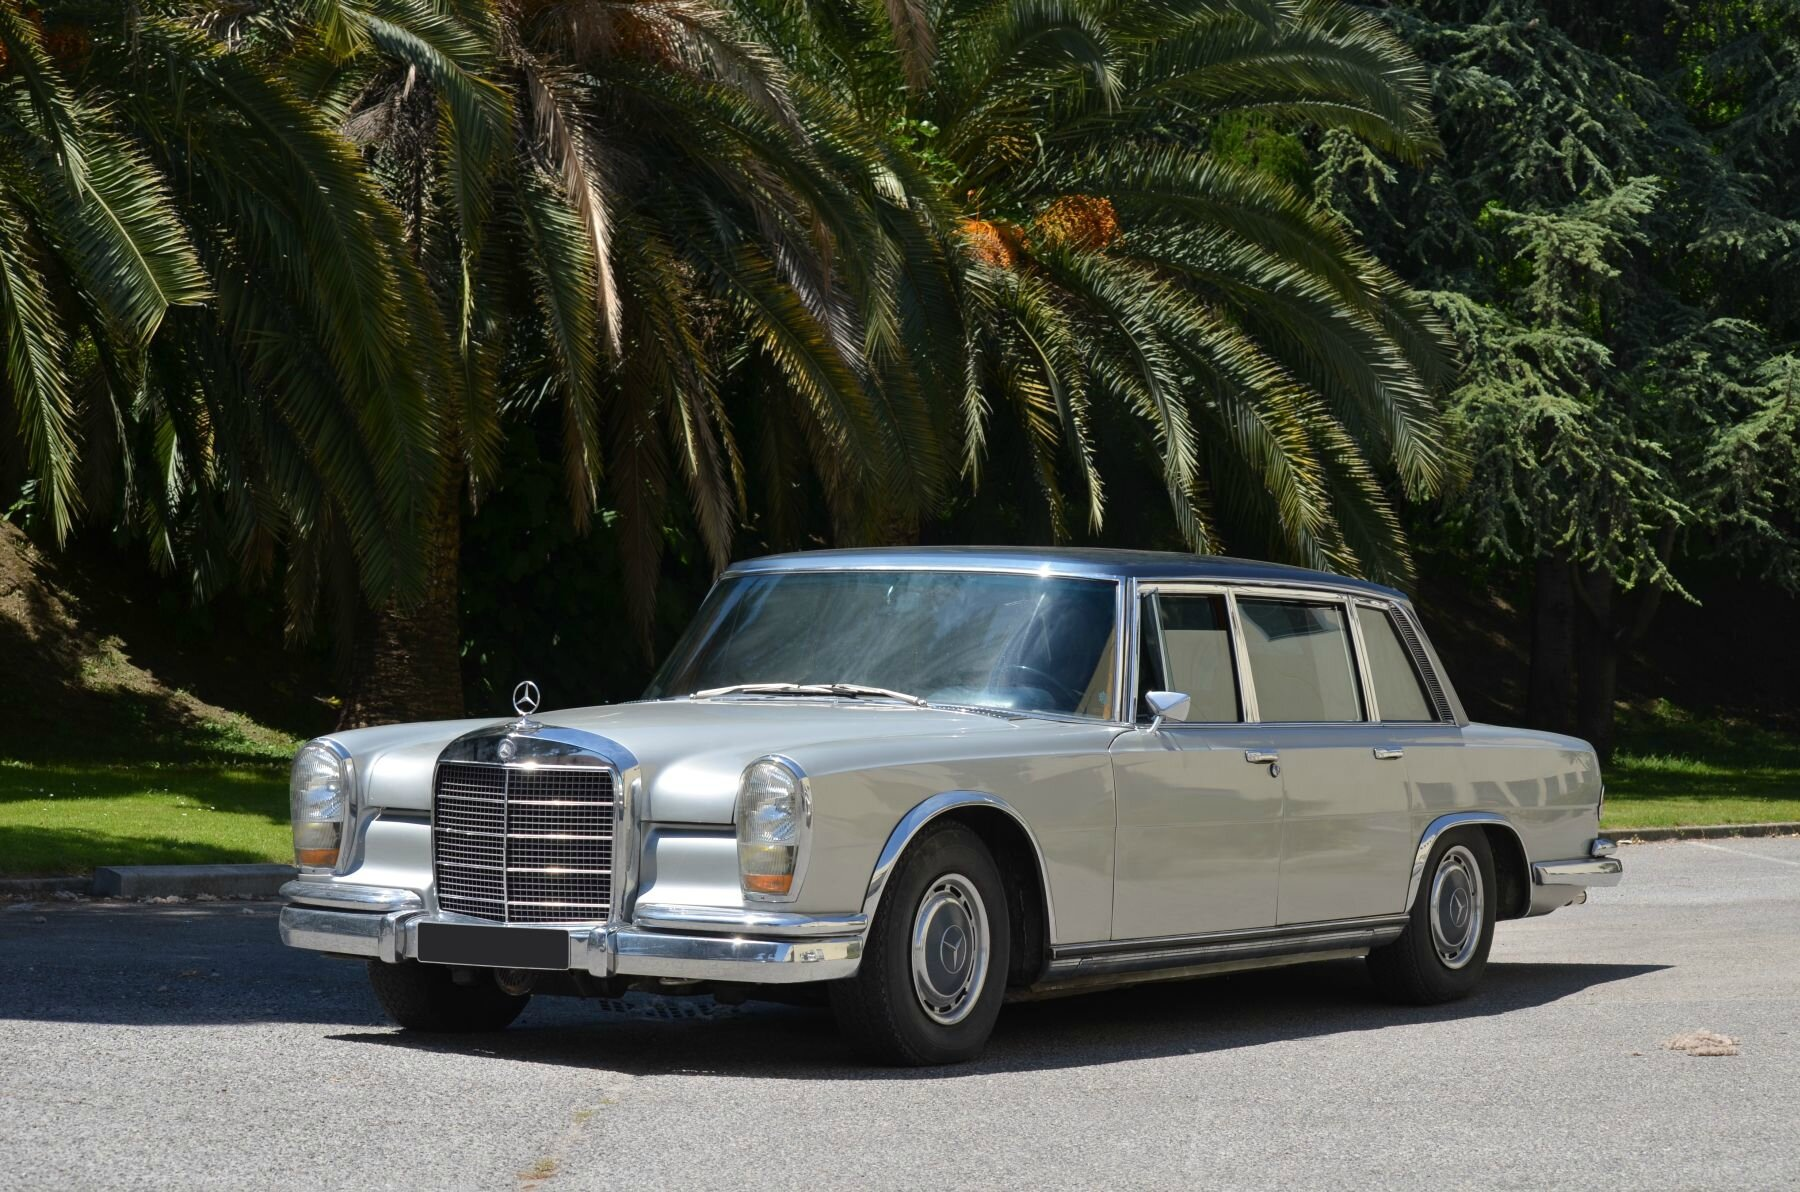 Ex Maria Callas - 1971 Mercedes-Benz 600 limousine